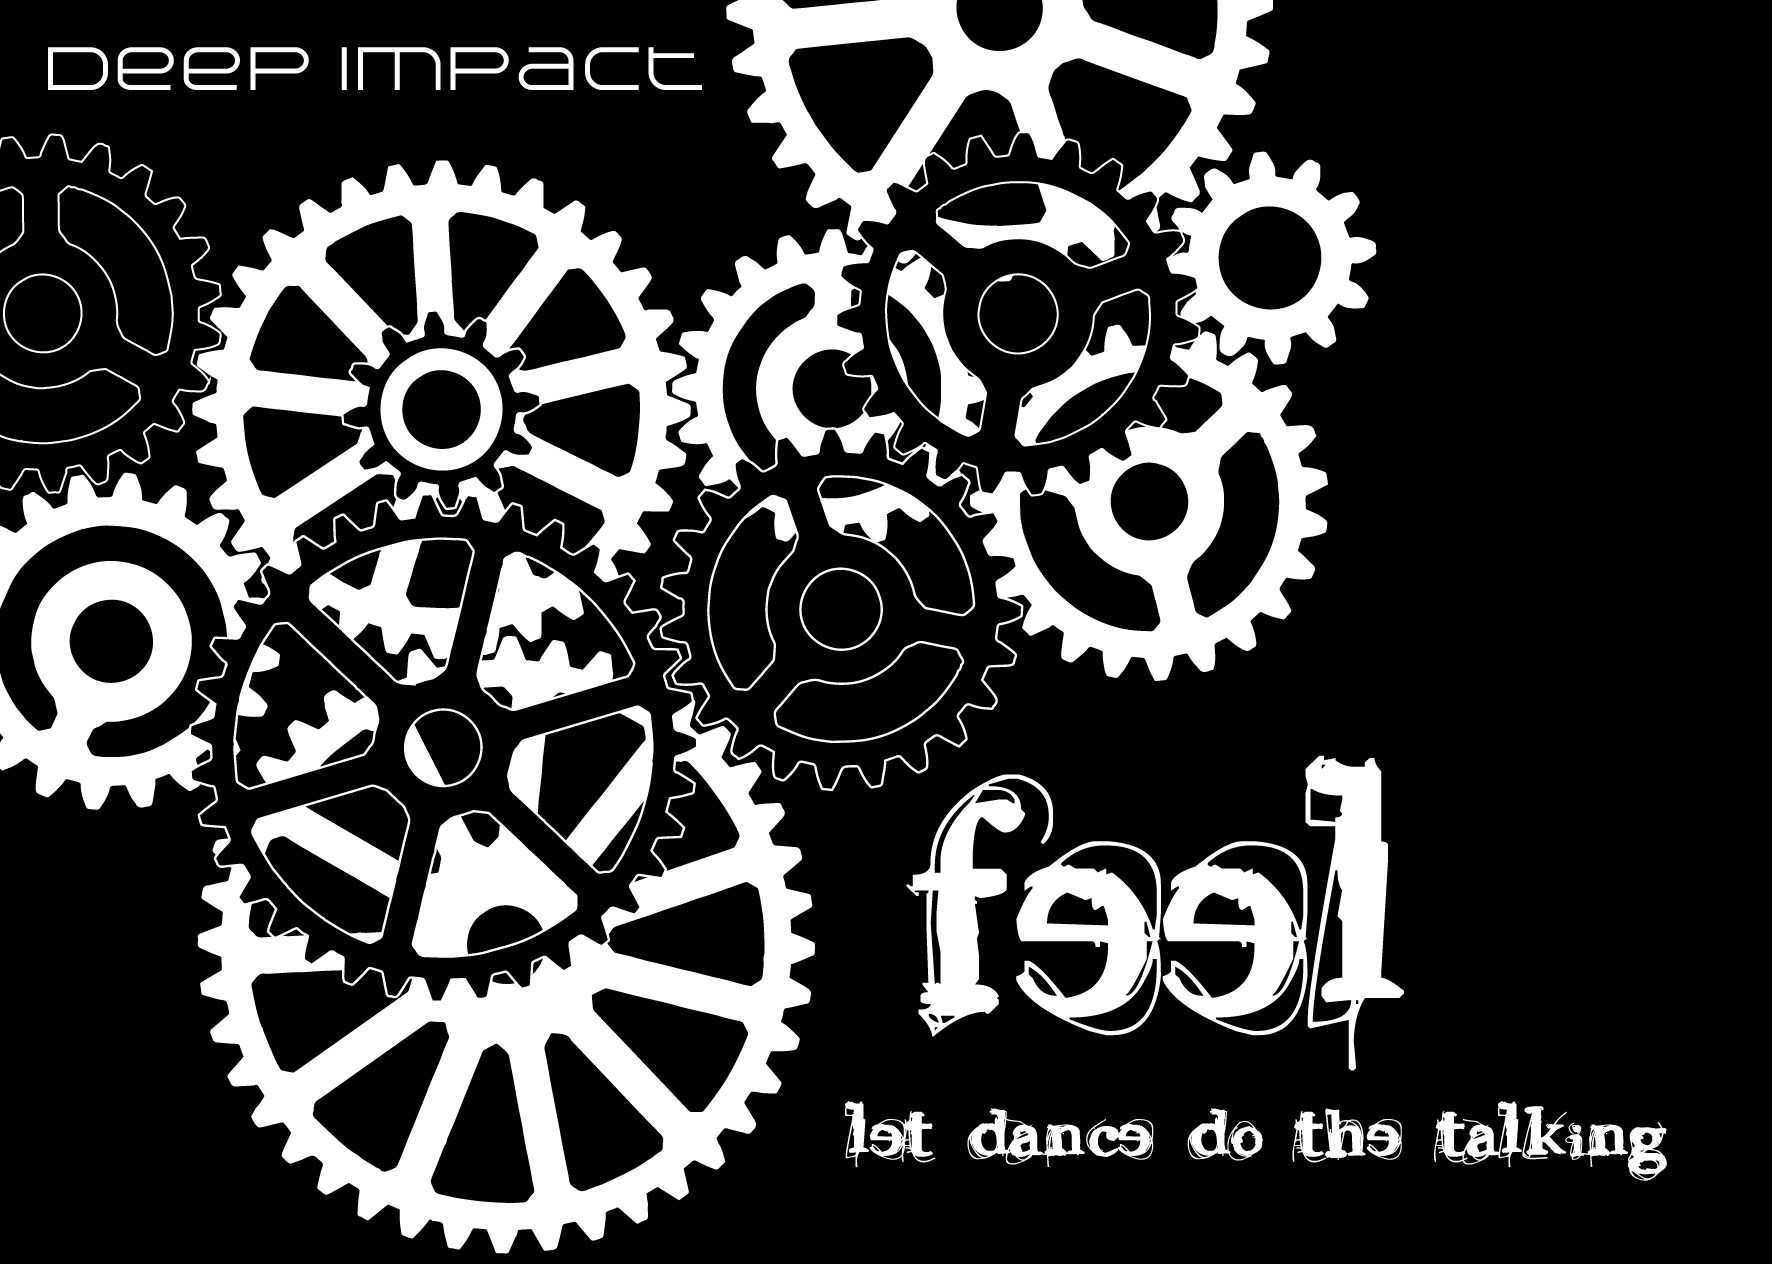 feel deep impact